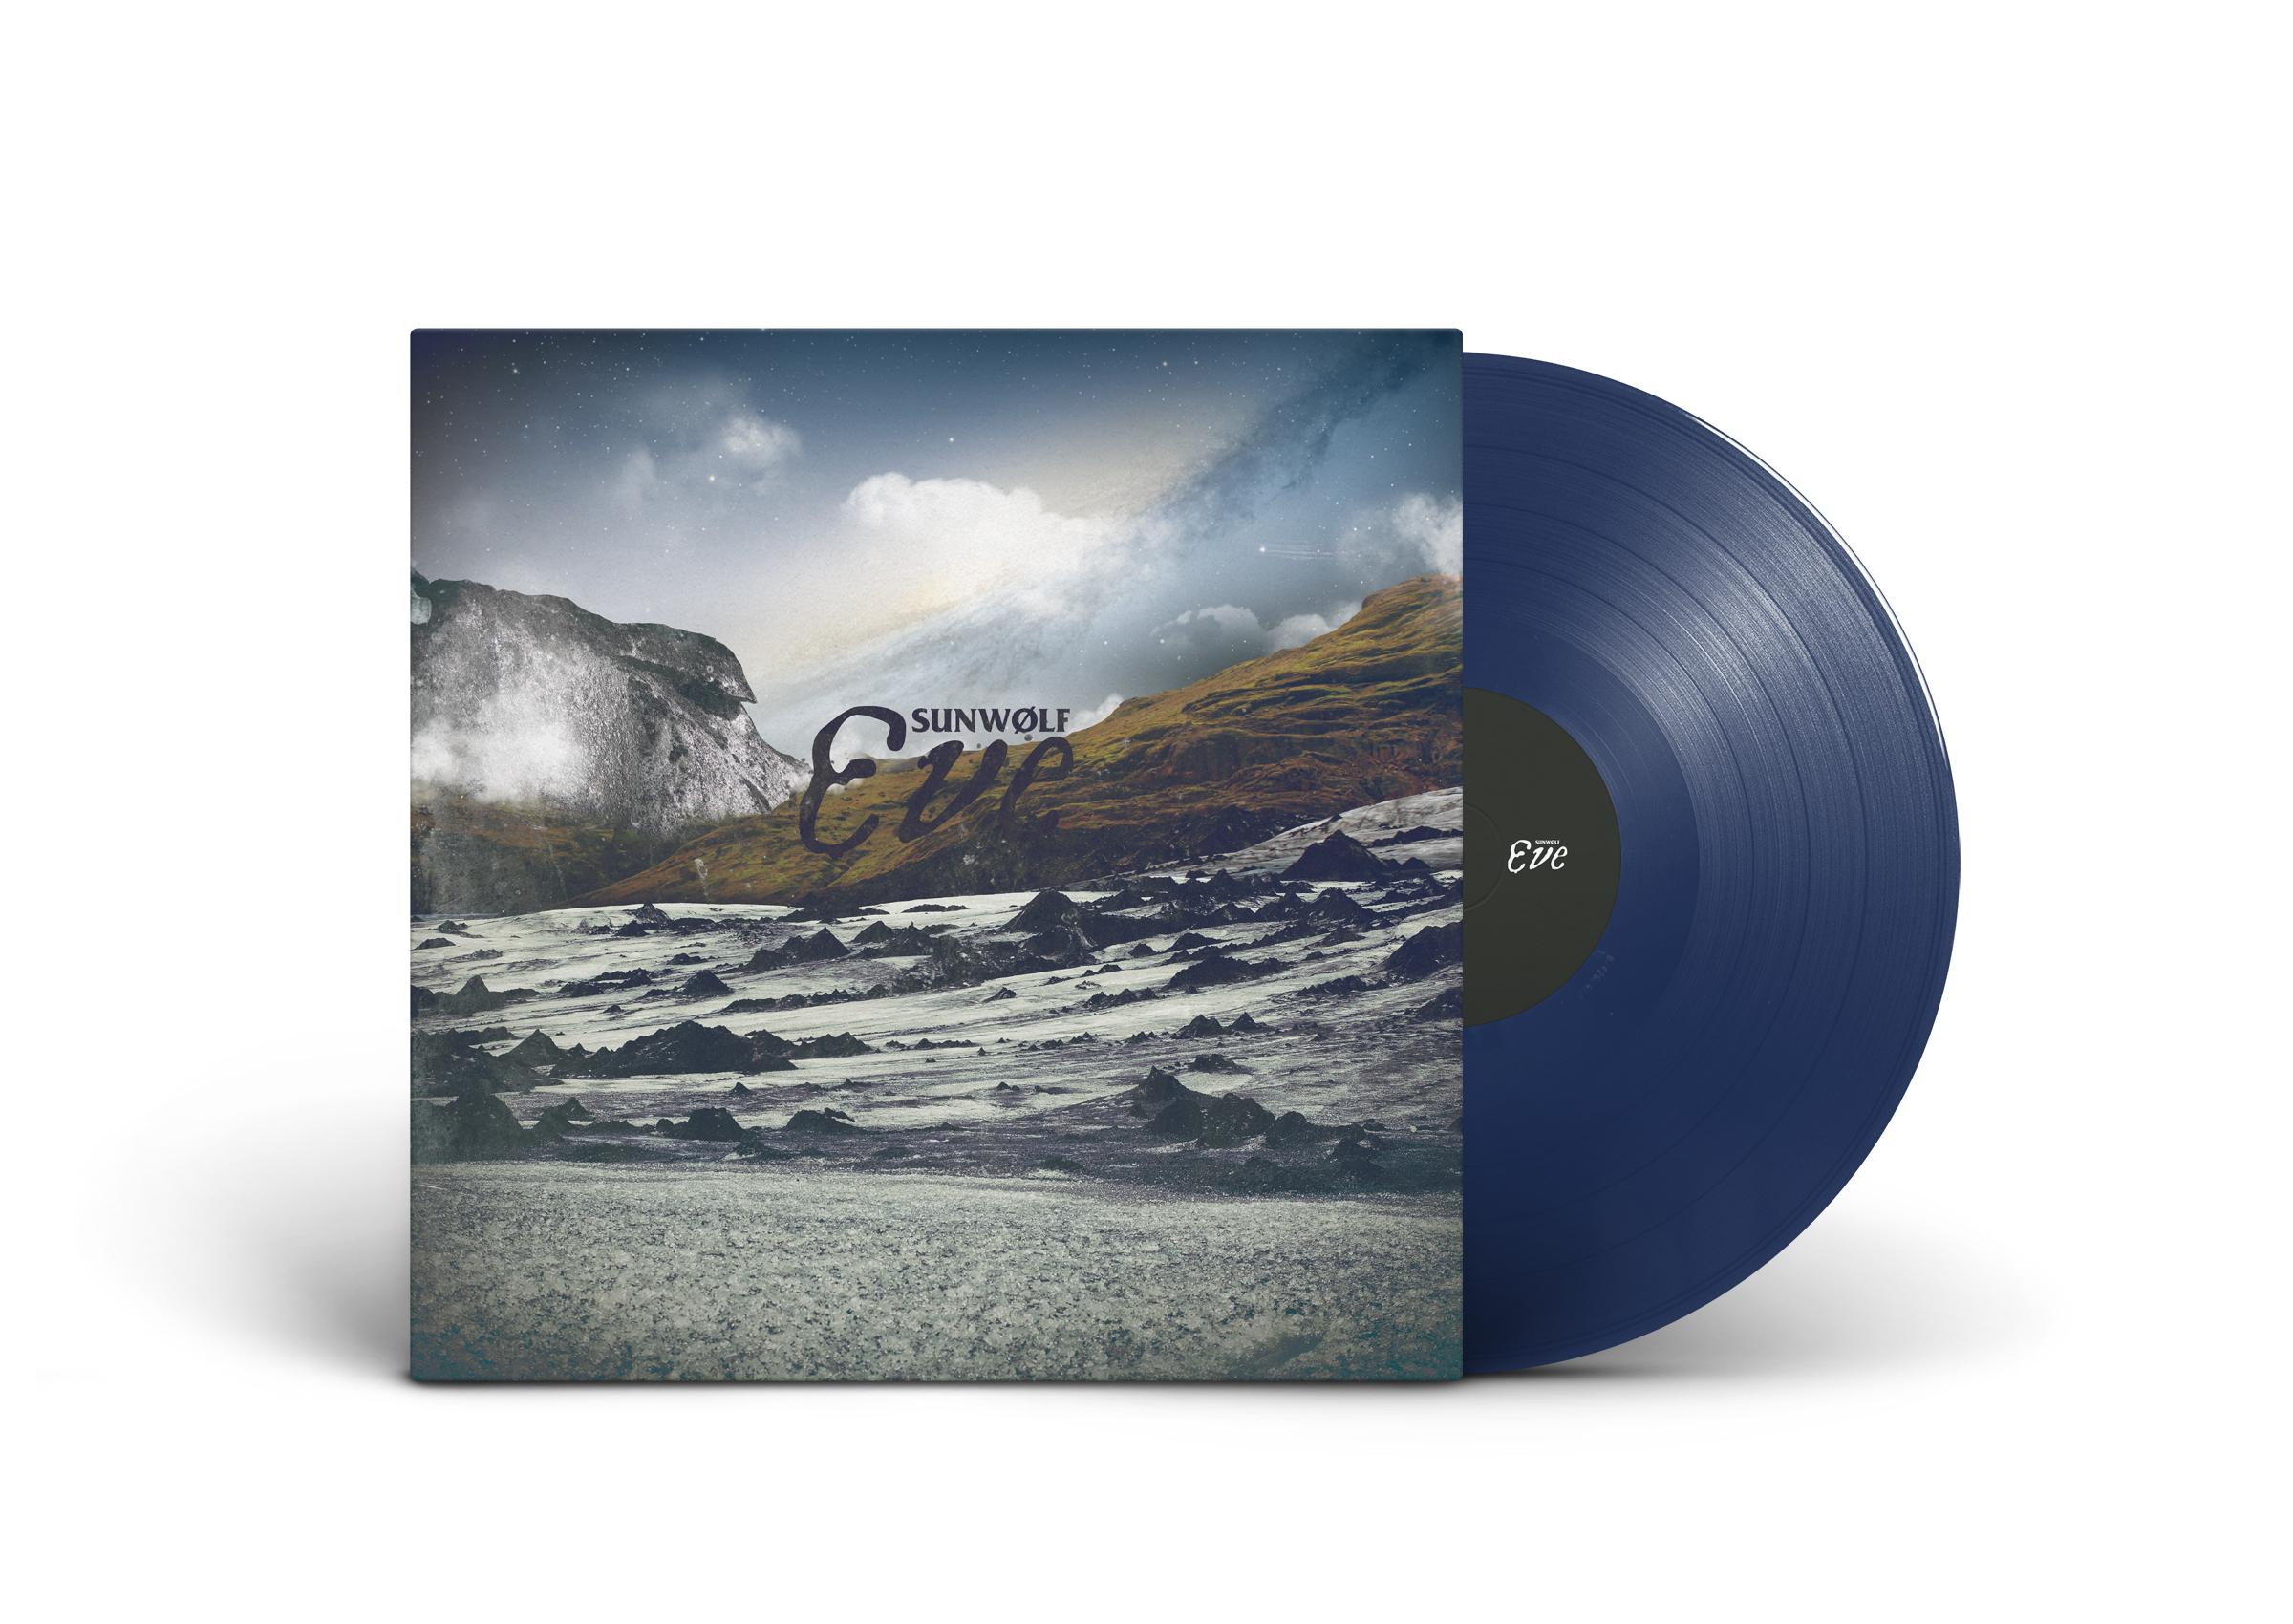 SUNWØLF 'EVE'   (2016, THRONE RECORDS)